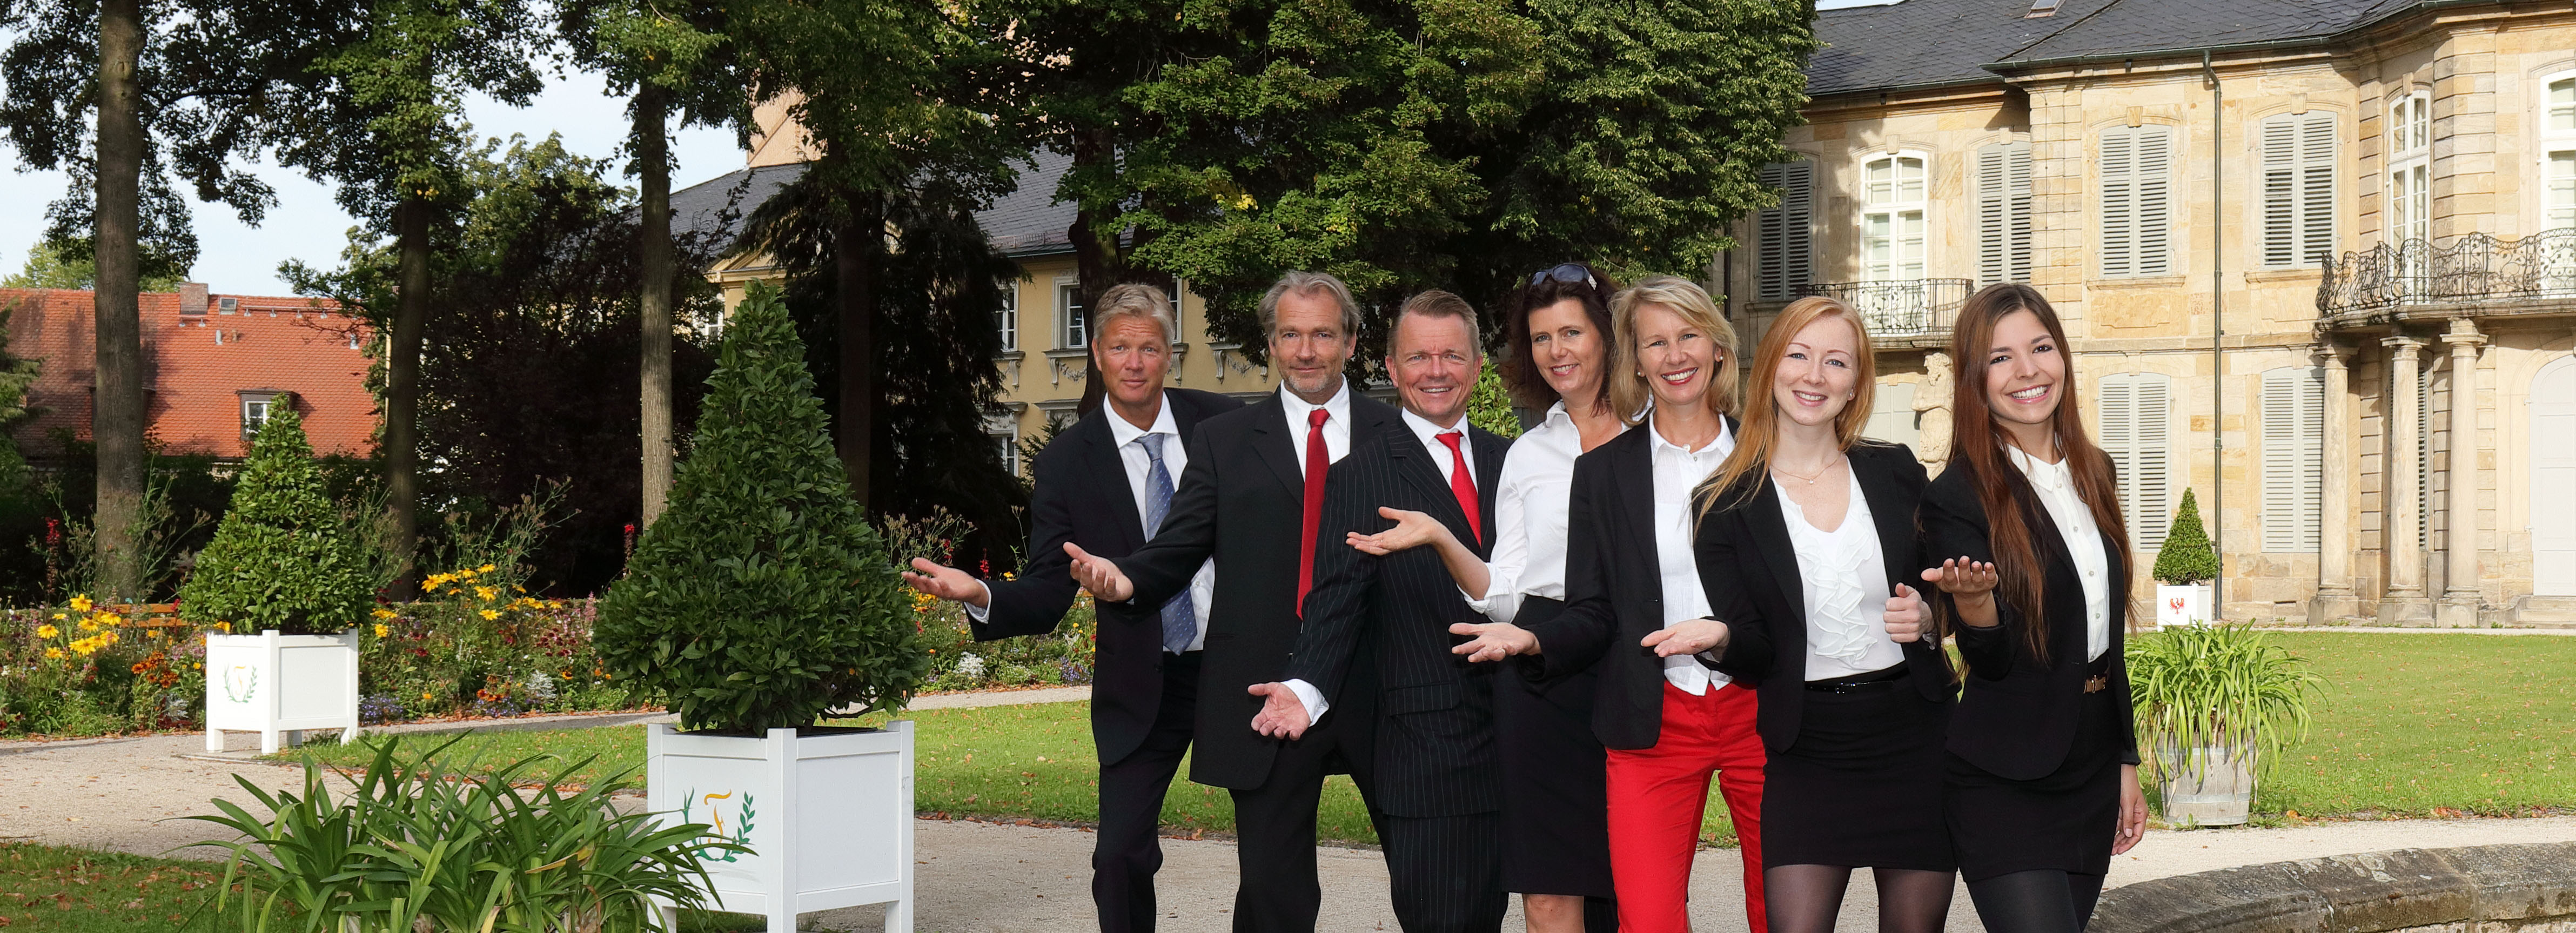 Immobilien in bayreuth ihr immobilienmakler engel for Immobilien nurnberg privat